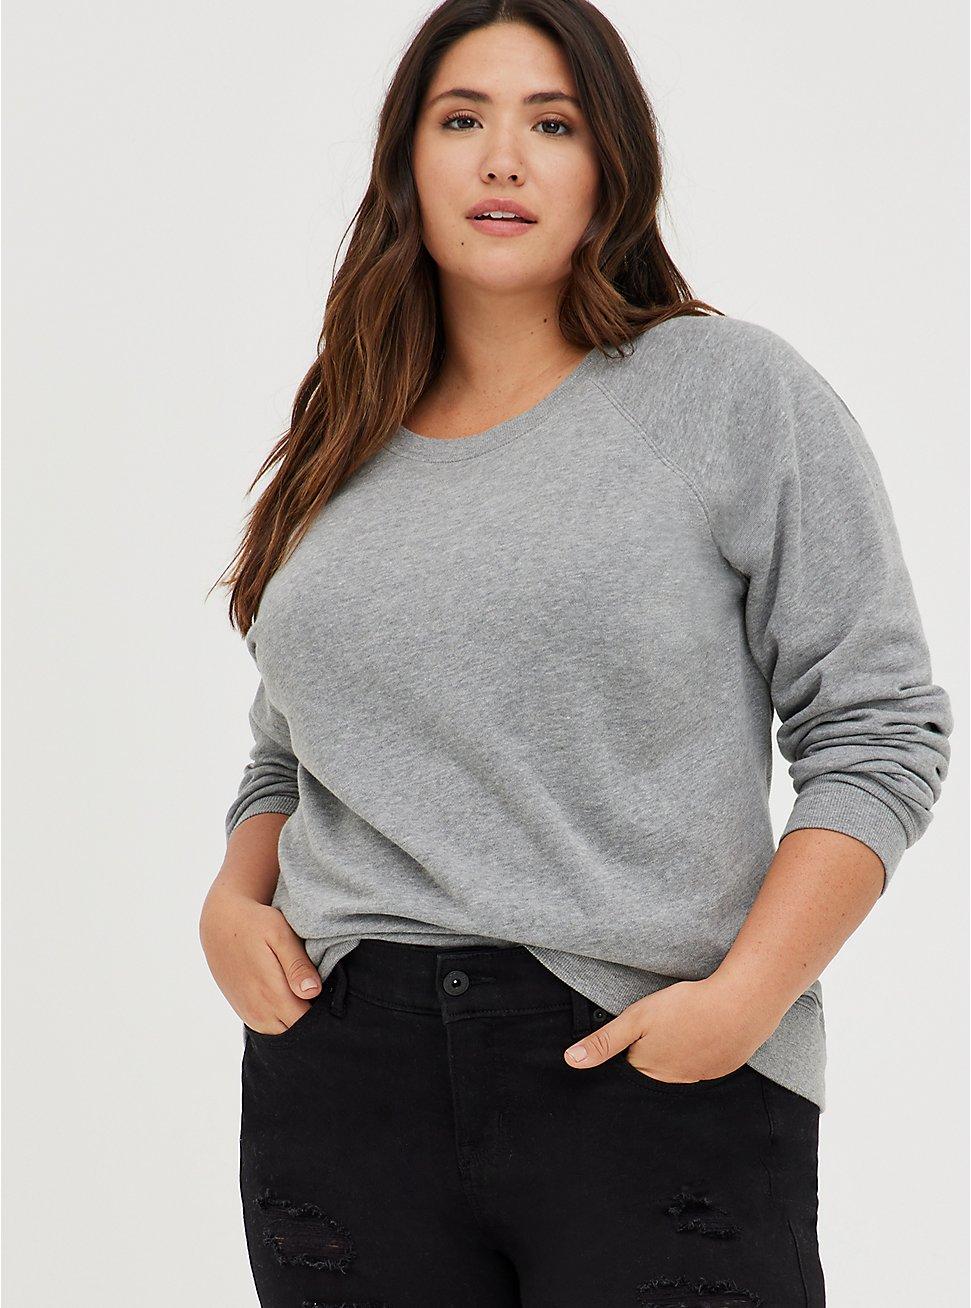 Raglan Sweatshirt - Cozy Fleece Heather Grey, HEATHER GREY, hi-res